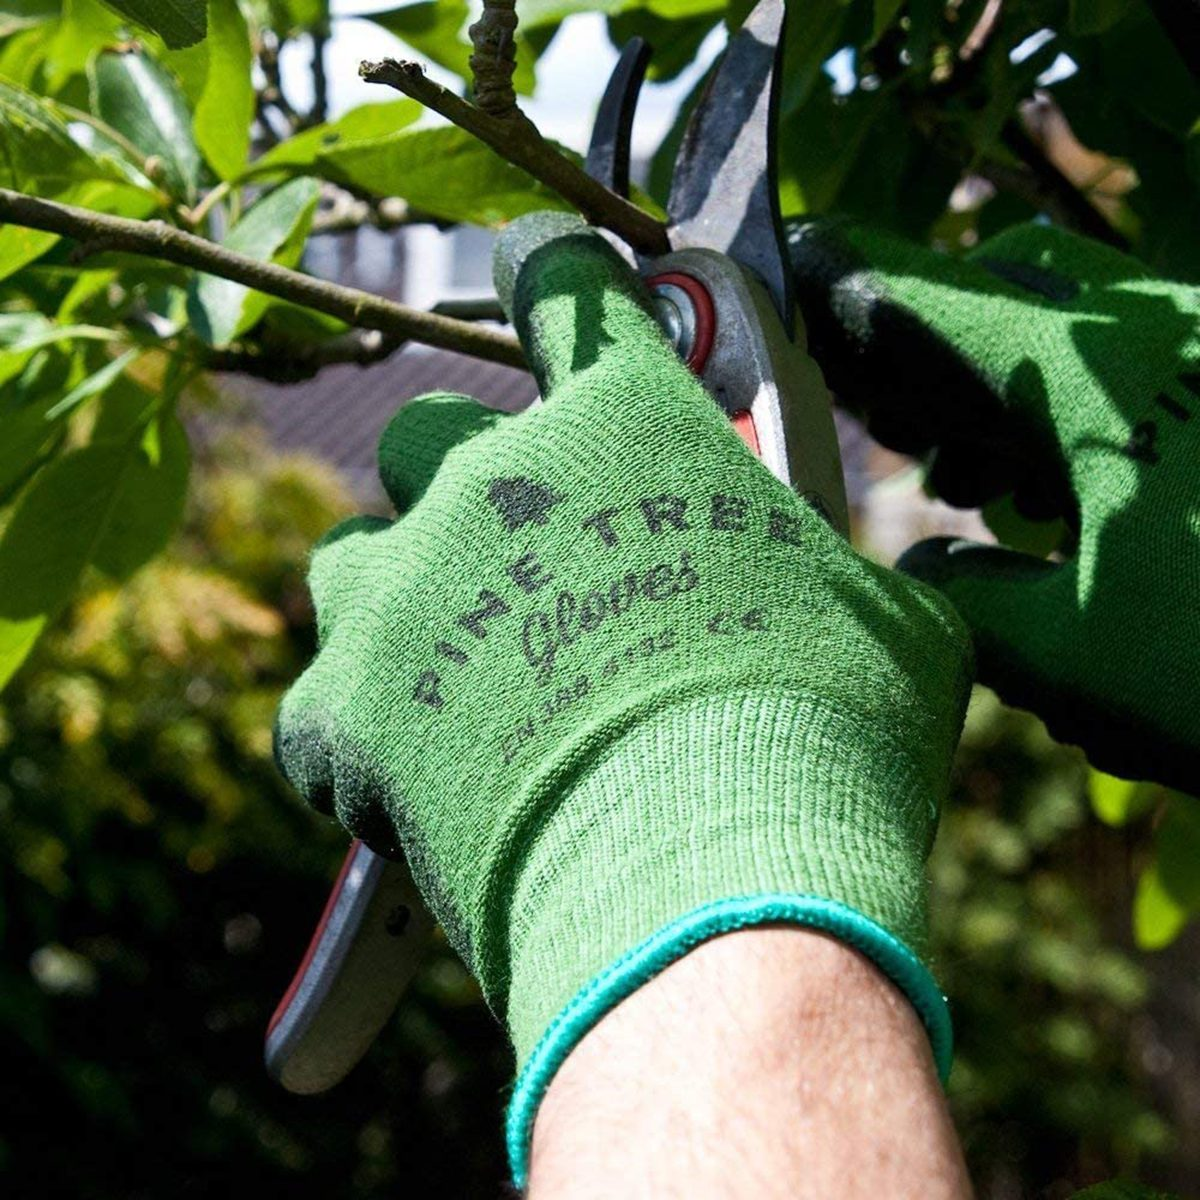 Man wear work gloves while pruning